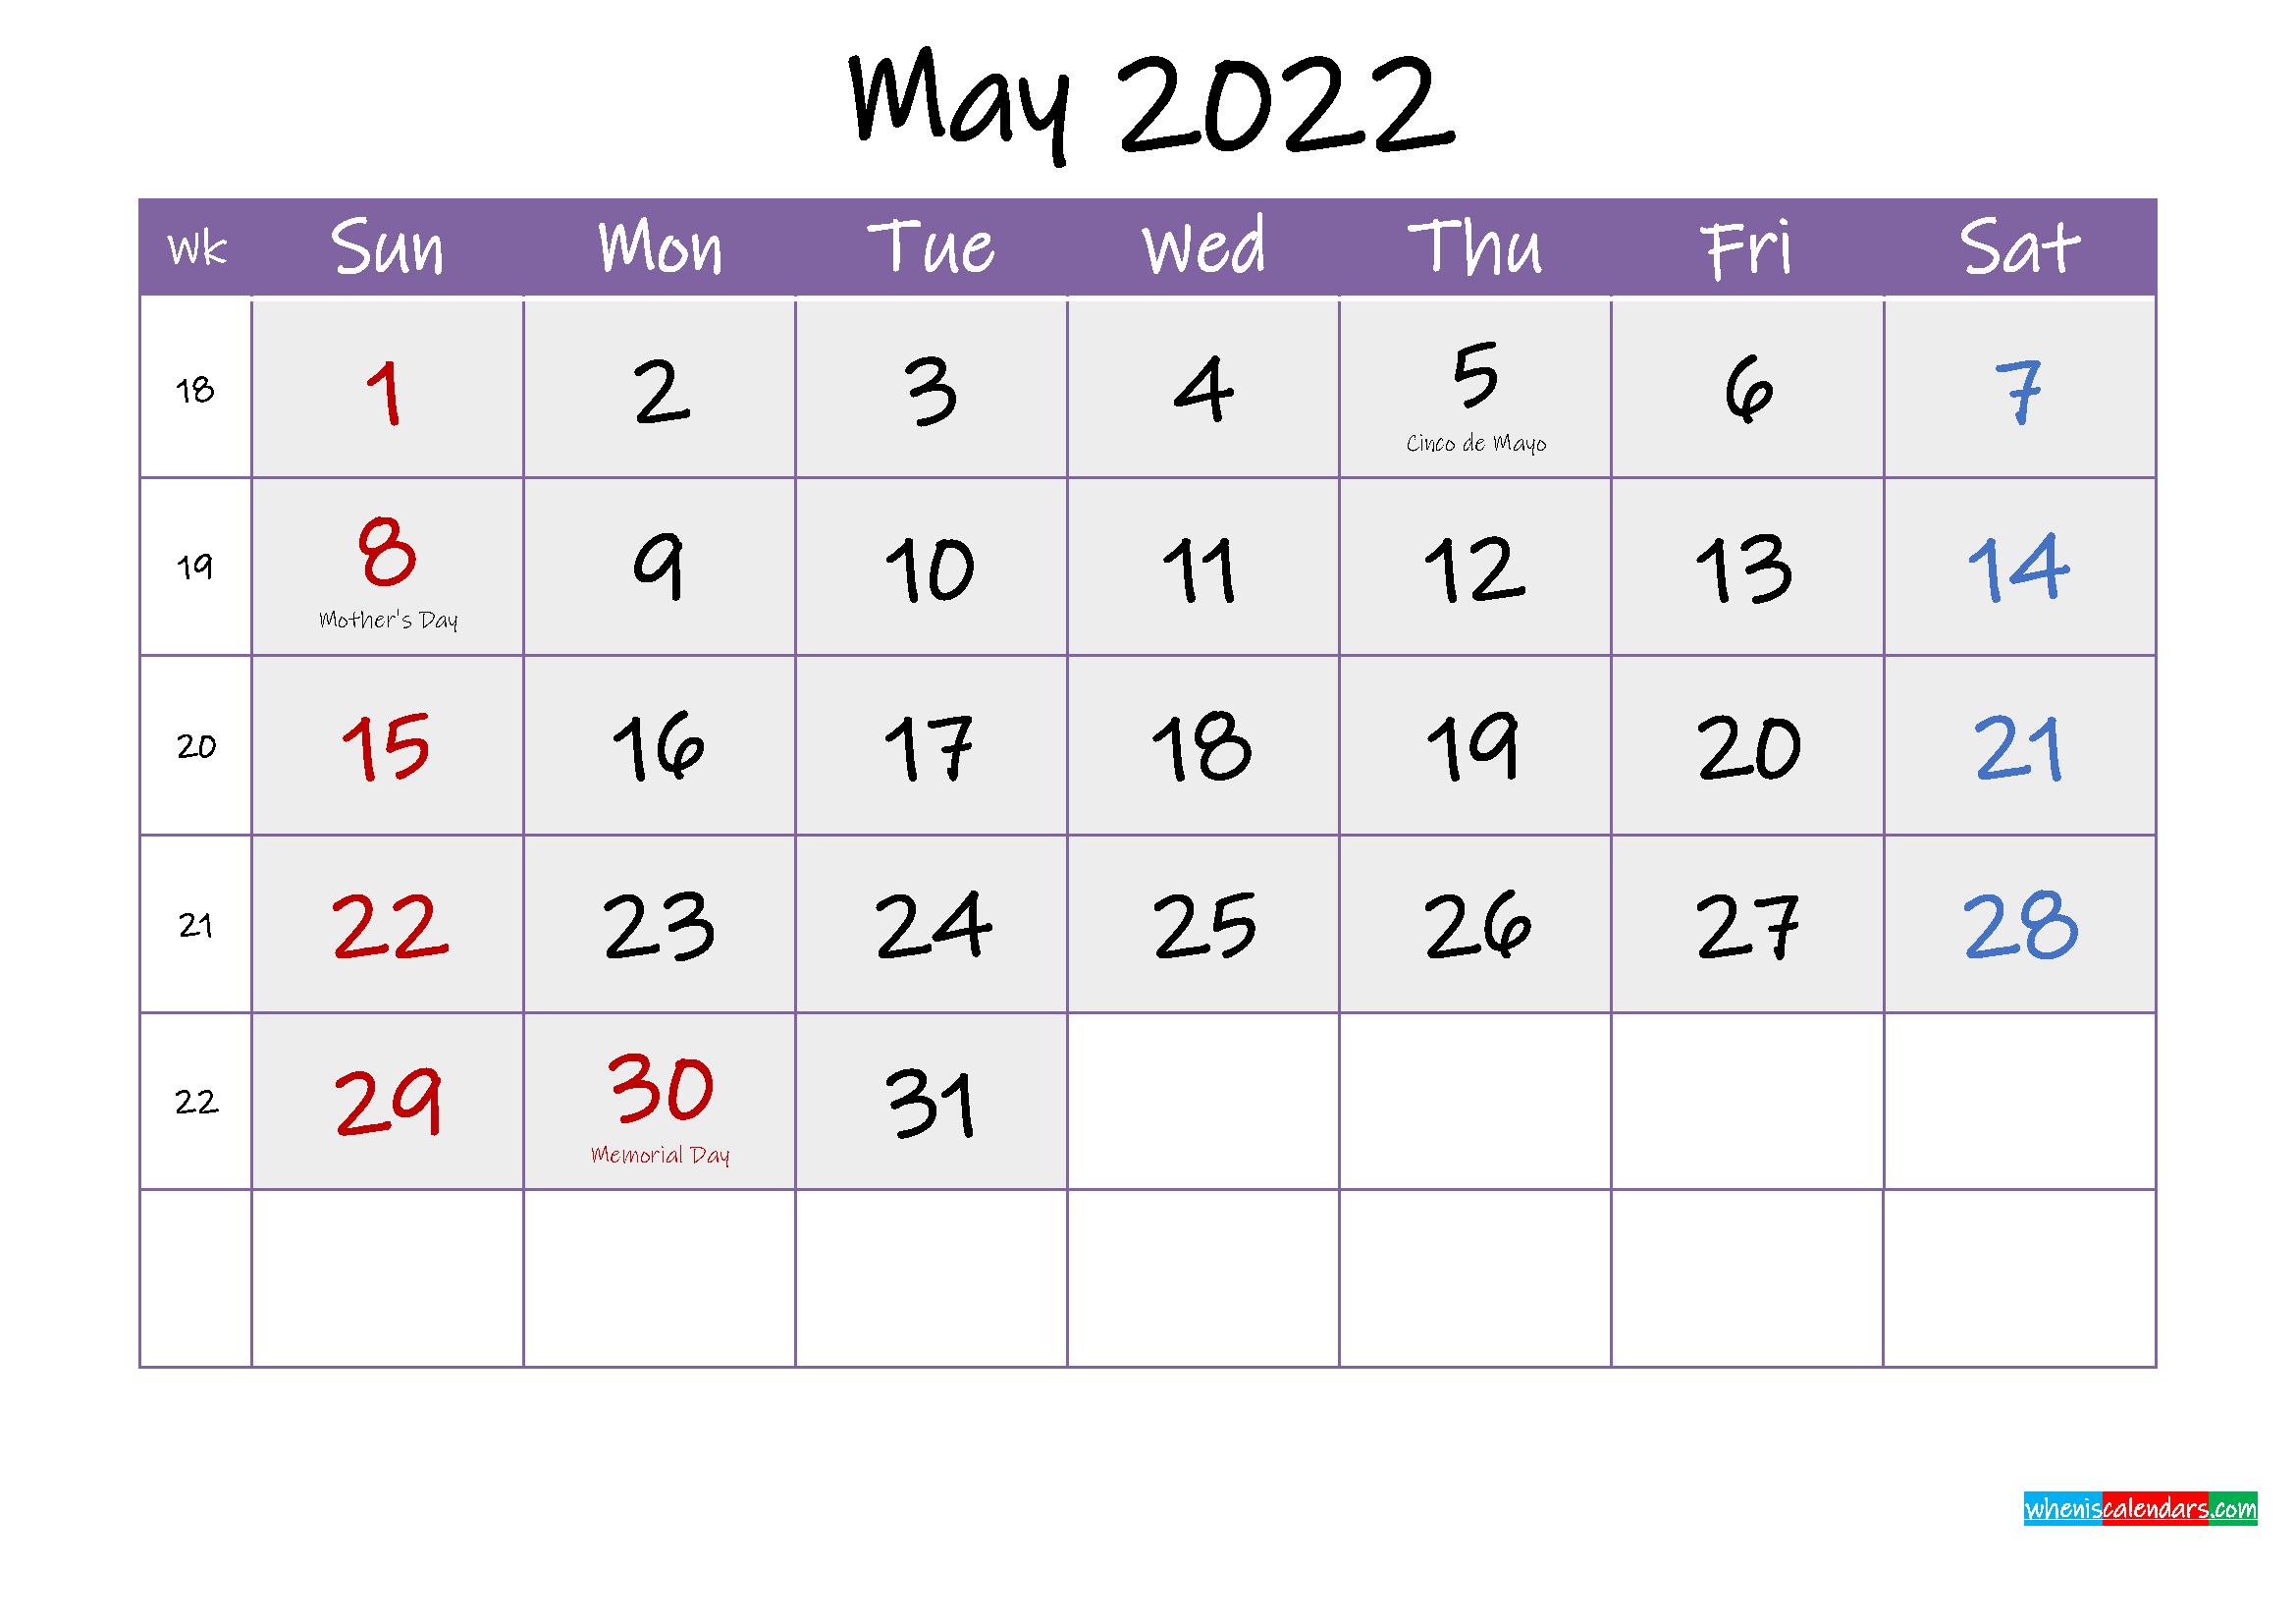 Free May 2022 Printable Calendar With Holidays - Template within Printable Mayl 2022 Calendar Image